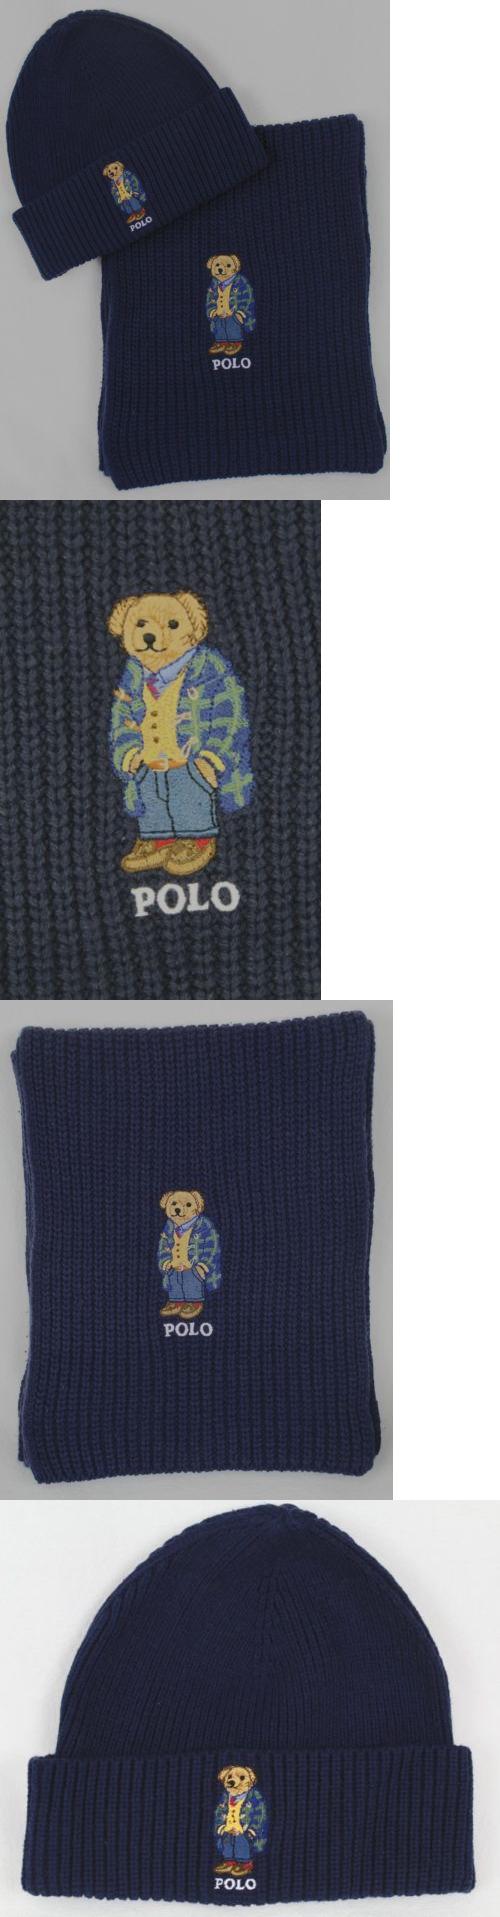 969ffd8e3da54 Scarves 52382  Polo Ralph Lauren Collectable Navy Blue Teddy Bear Scarf  Beanie Hat Set Nwt -  BUY IT NOW ONLY   118.99 on eBay!